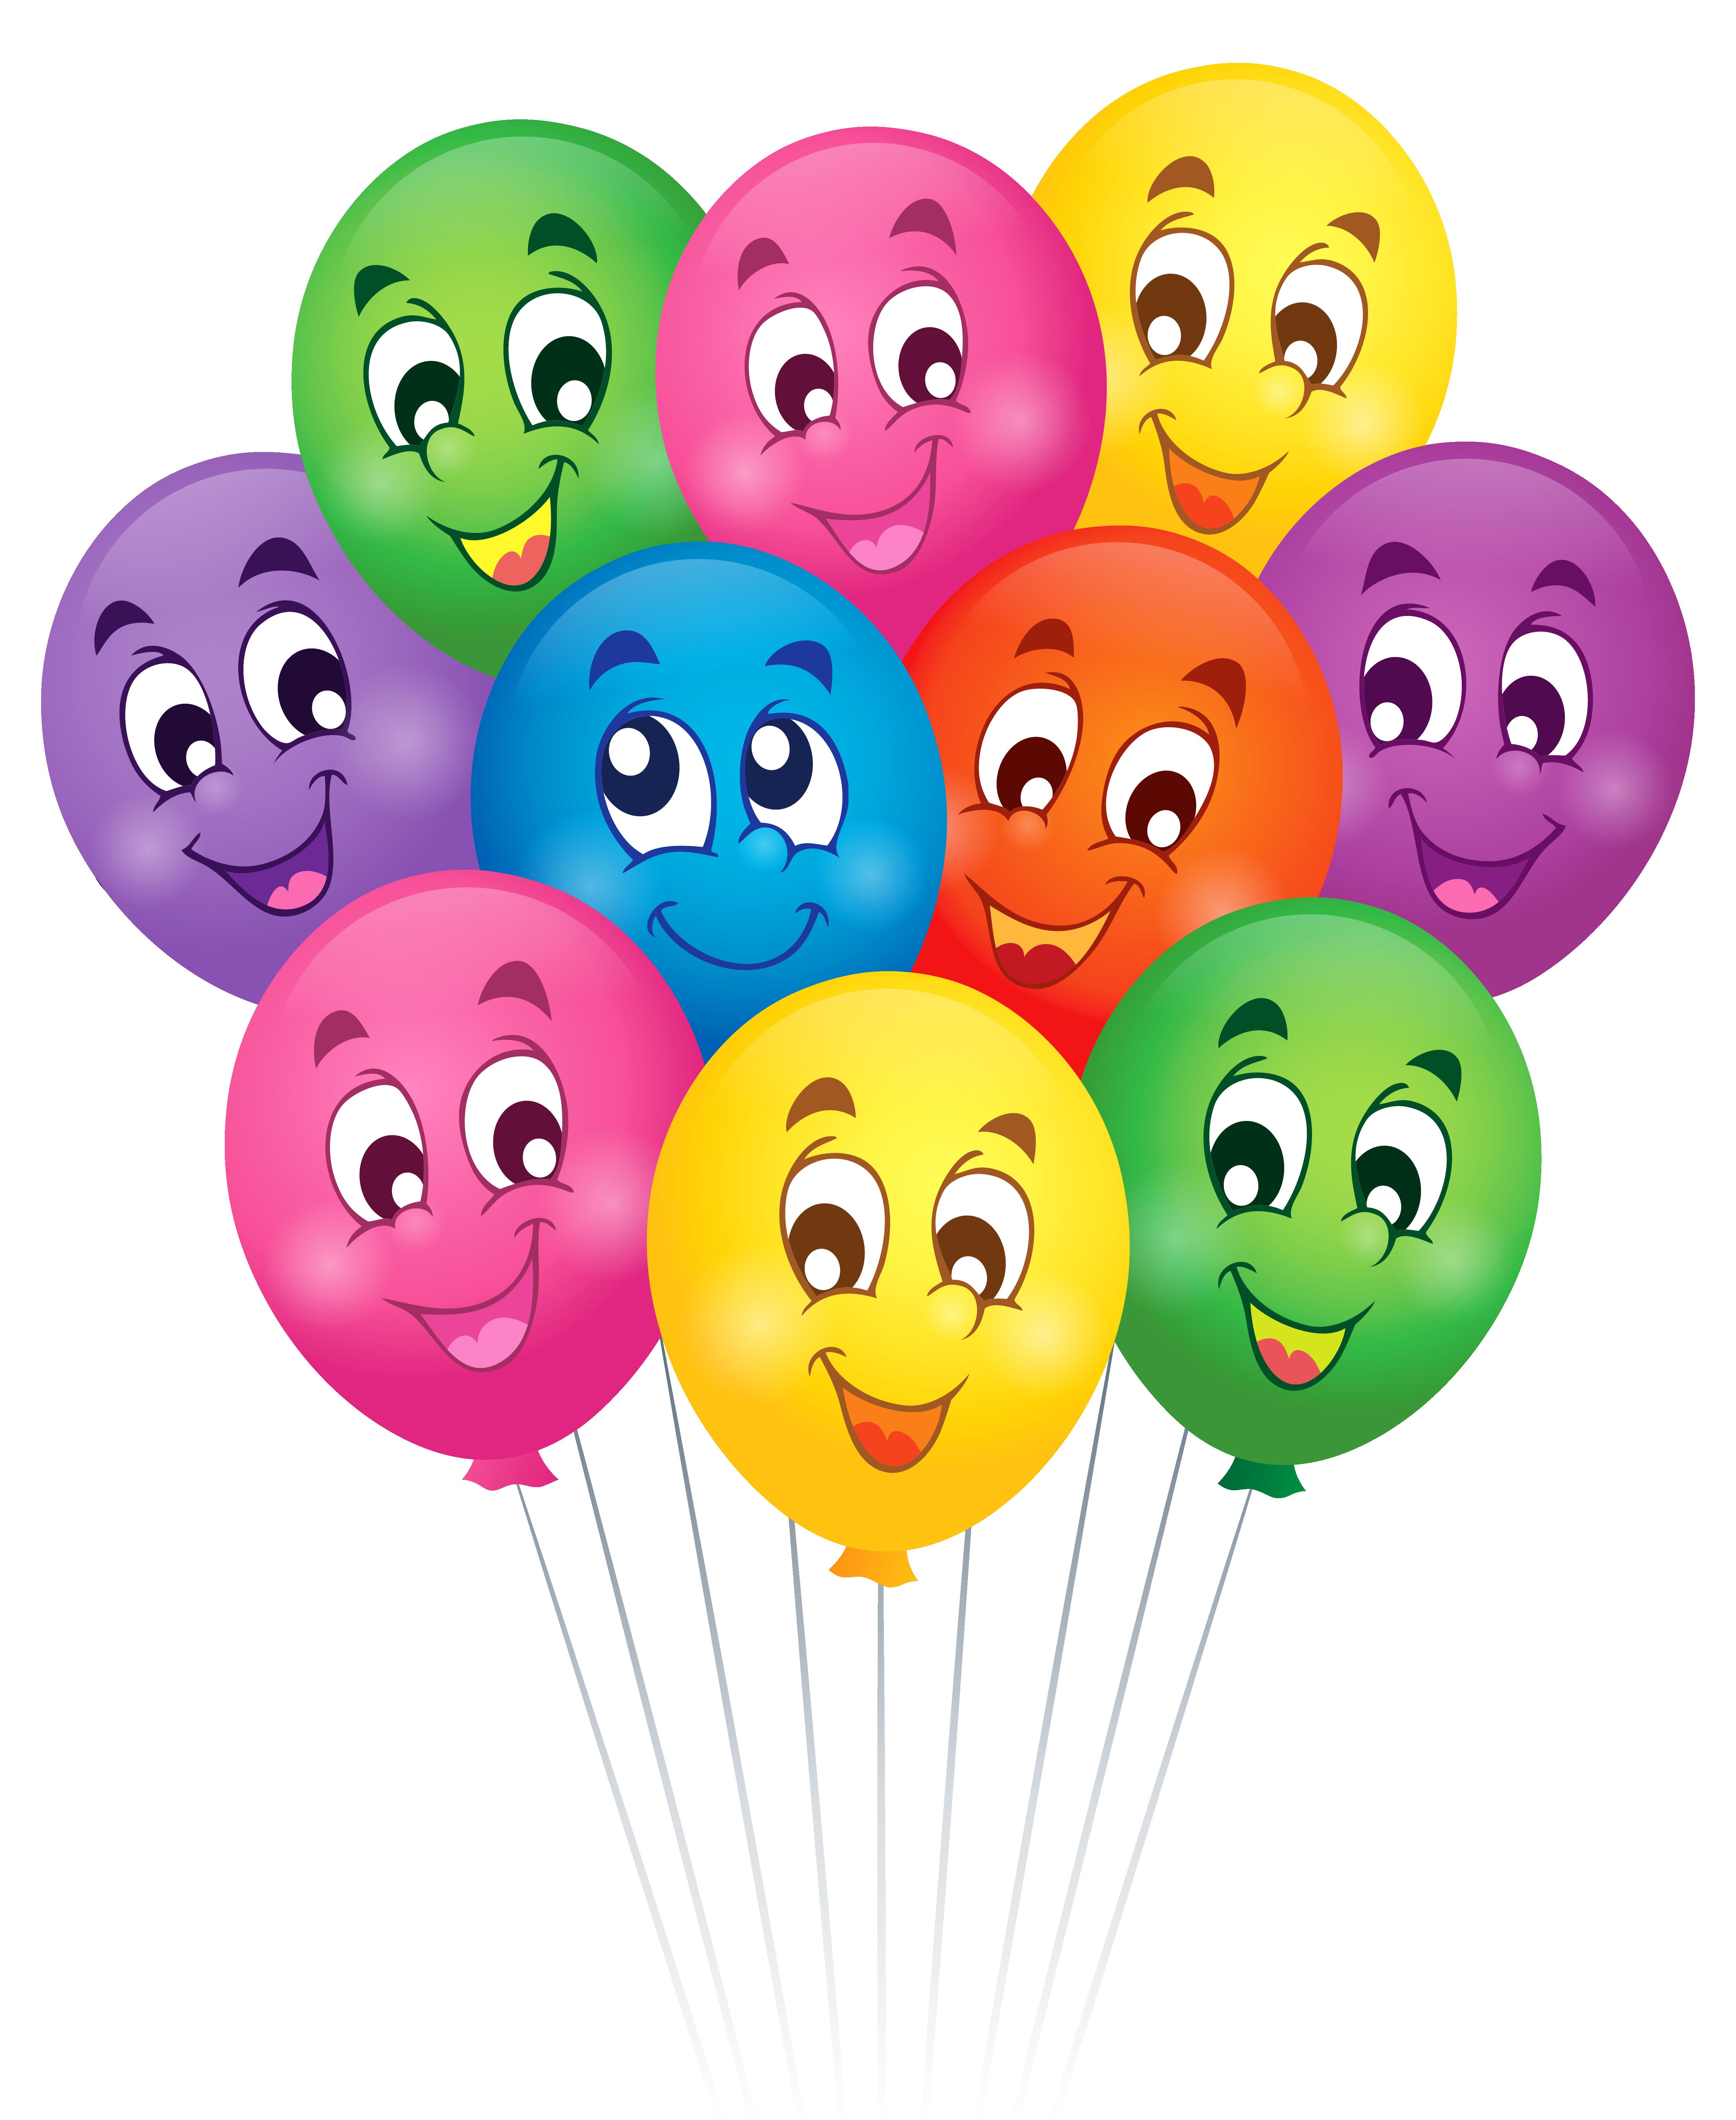 Balloons with faces png. Clipart balloon cartoon